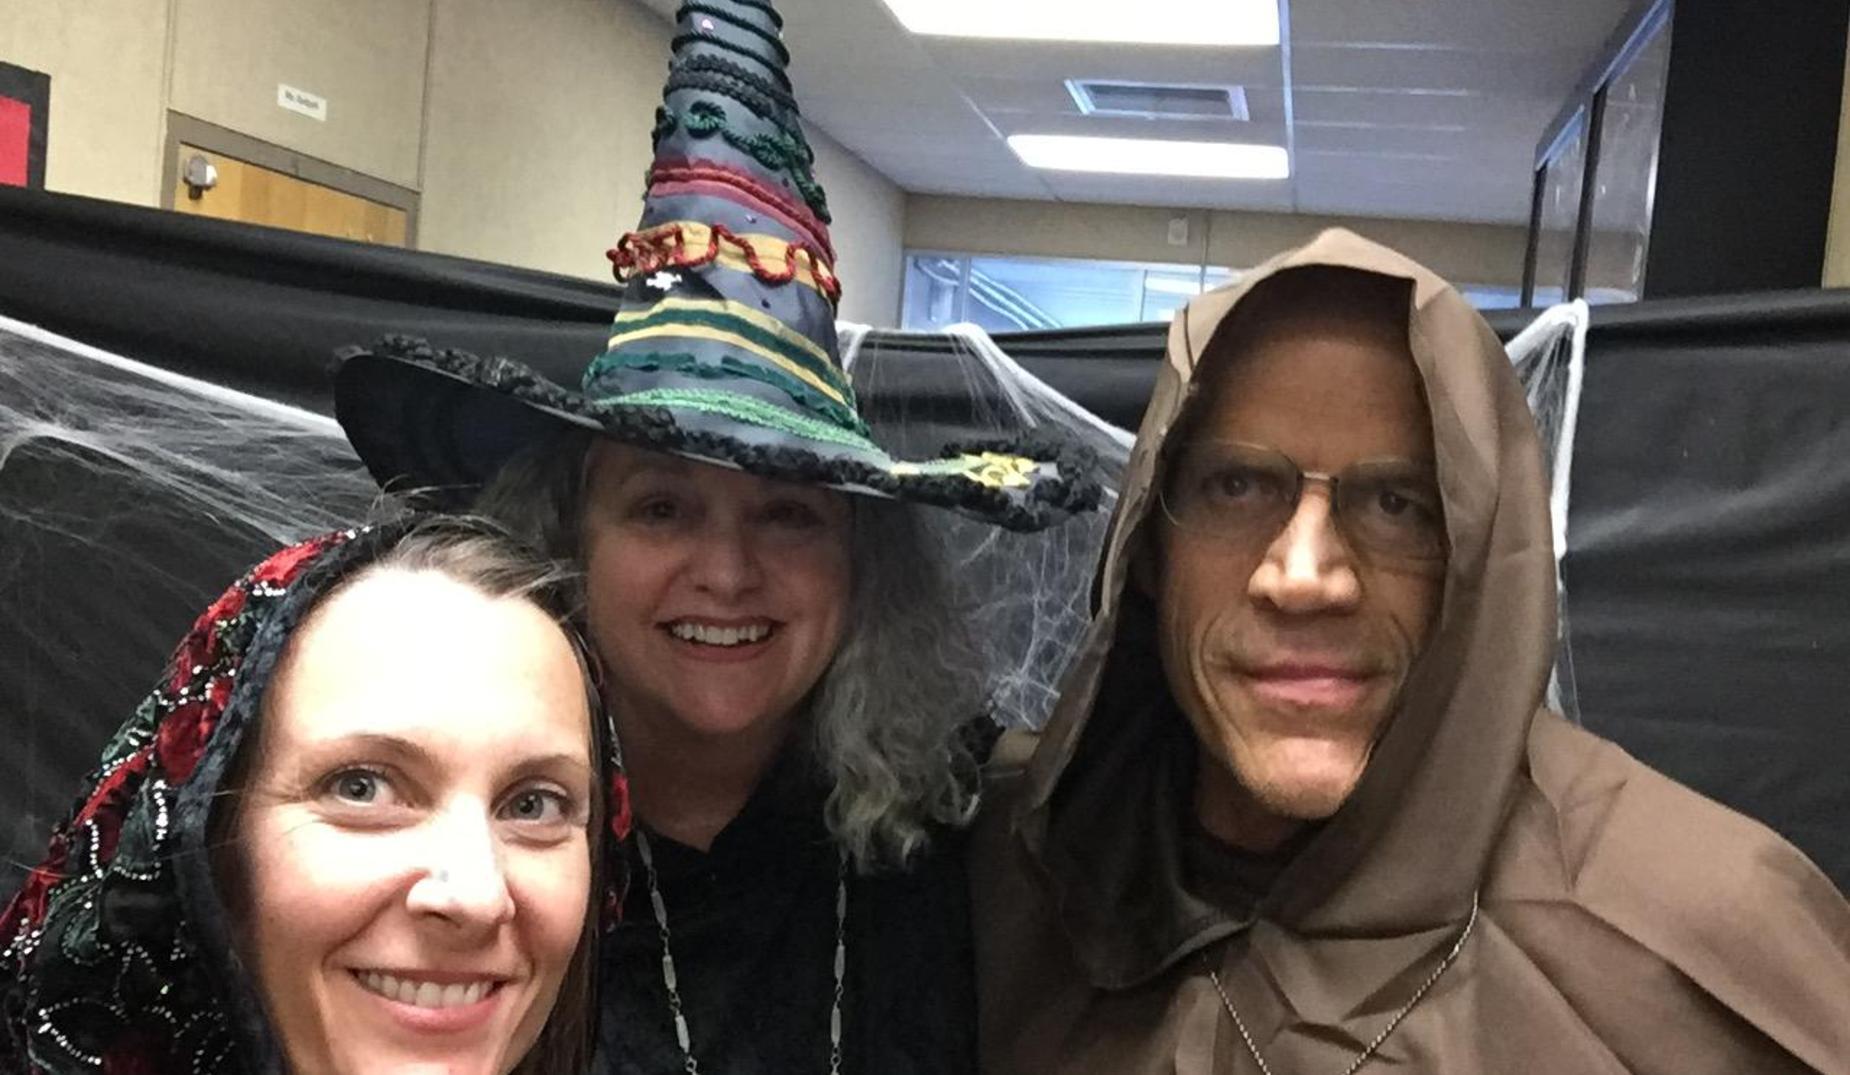 Three PHS teachers dressed for Halloween